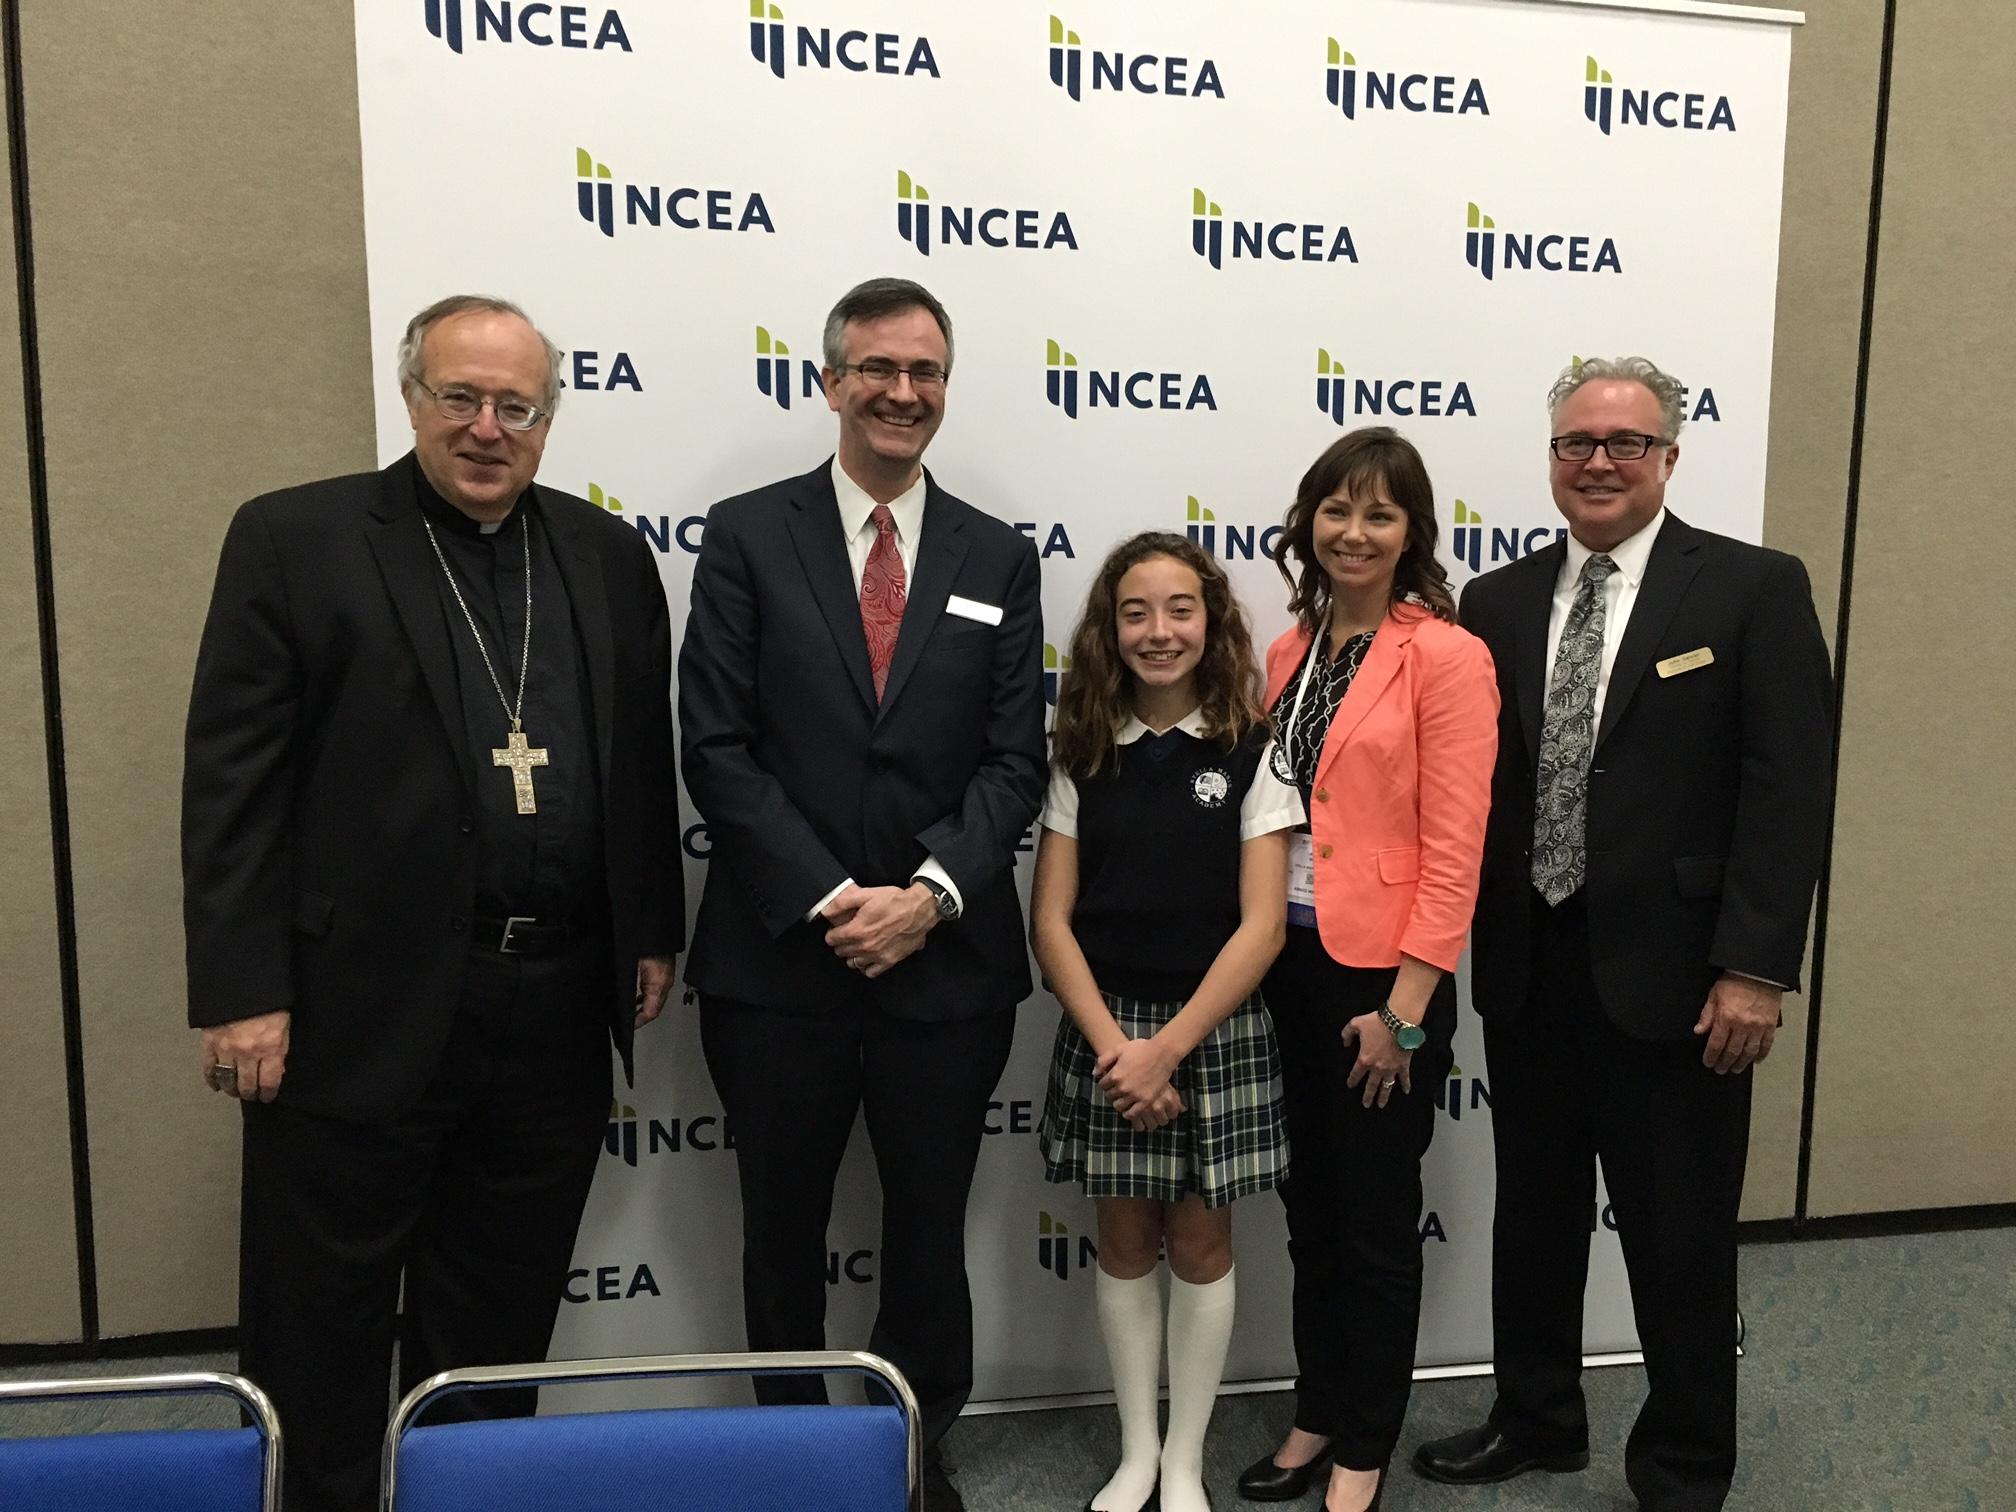 NCEA 2016 Press Briefing